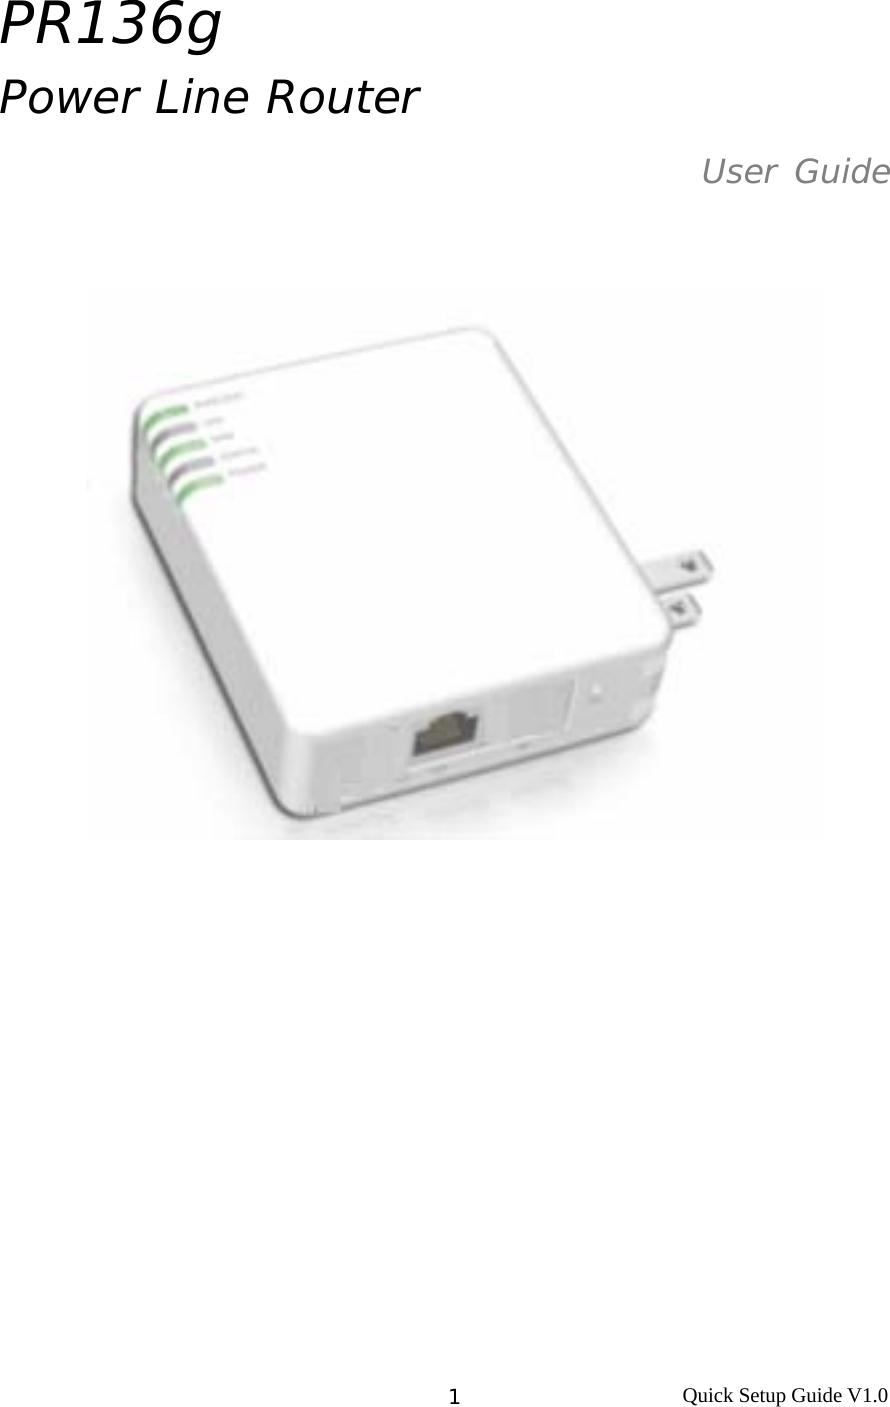 E Top Network Technology Pr136g 85m Homeplug Wireless Ethernet Logitech Webcam C300 Wiring Diagram Broadband Router User Manual Guide 20071025